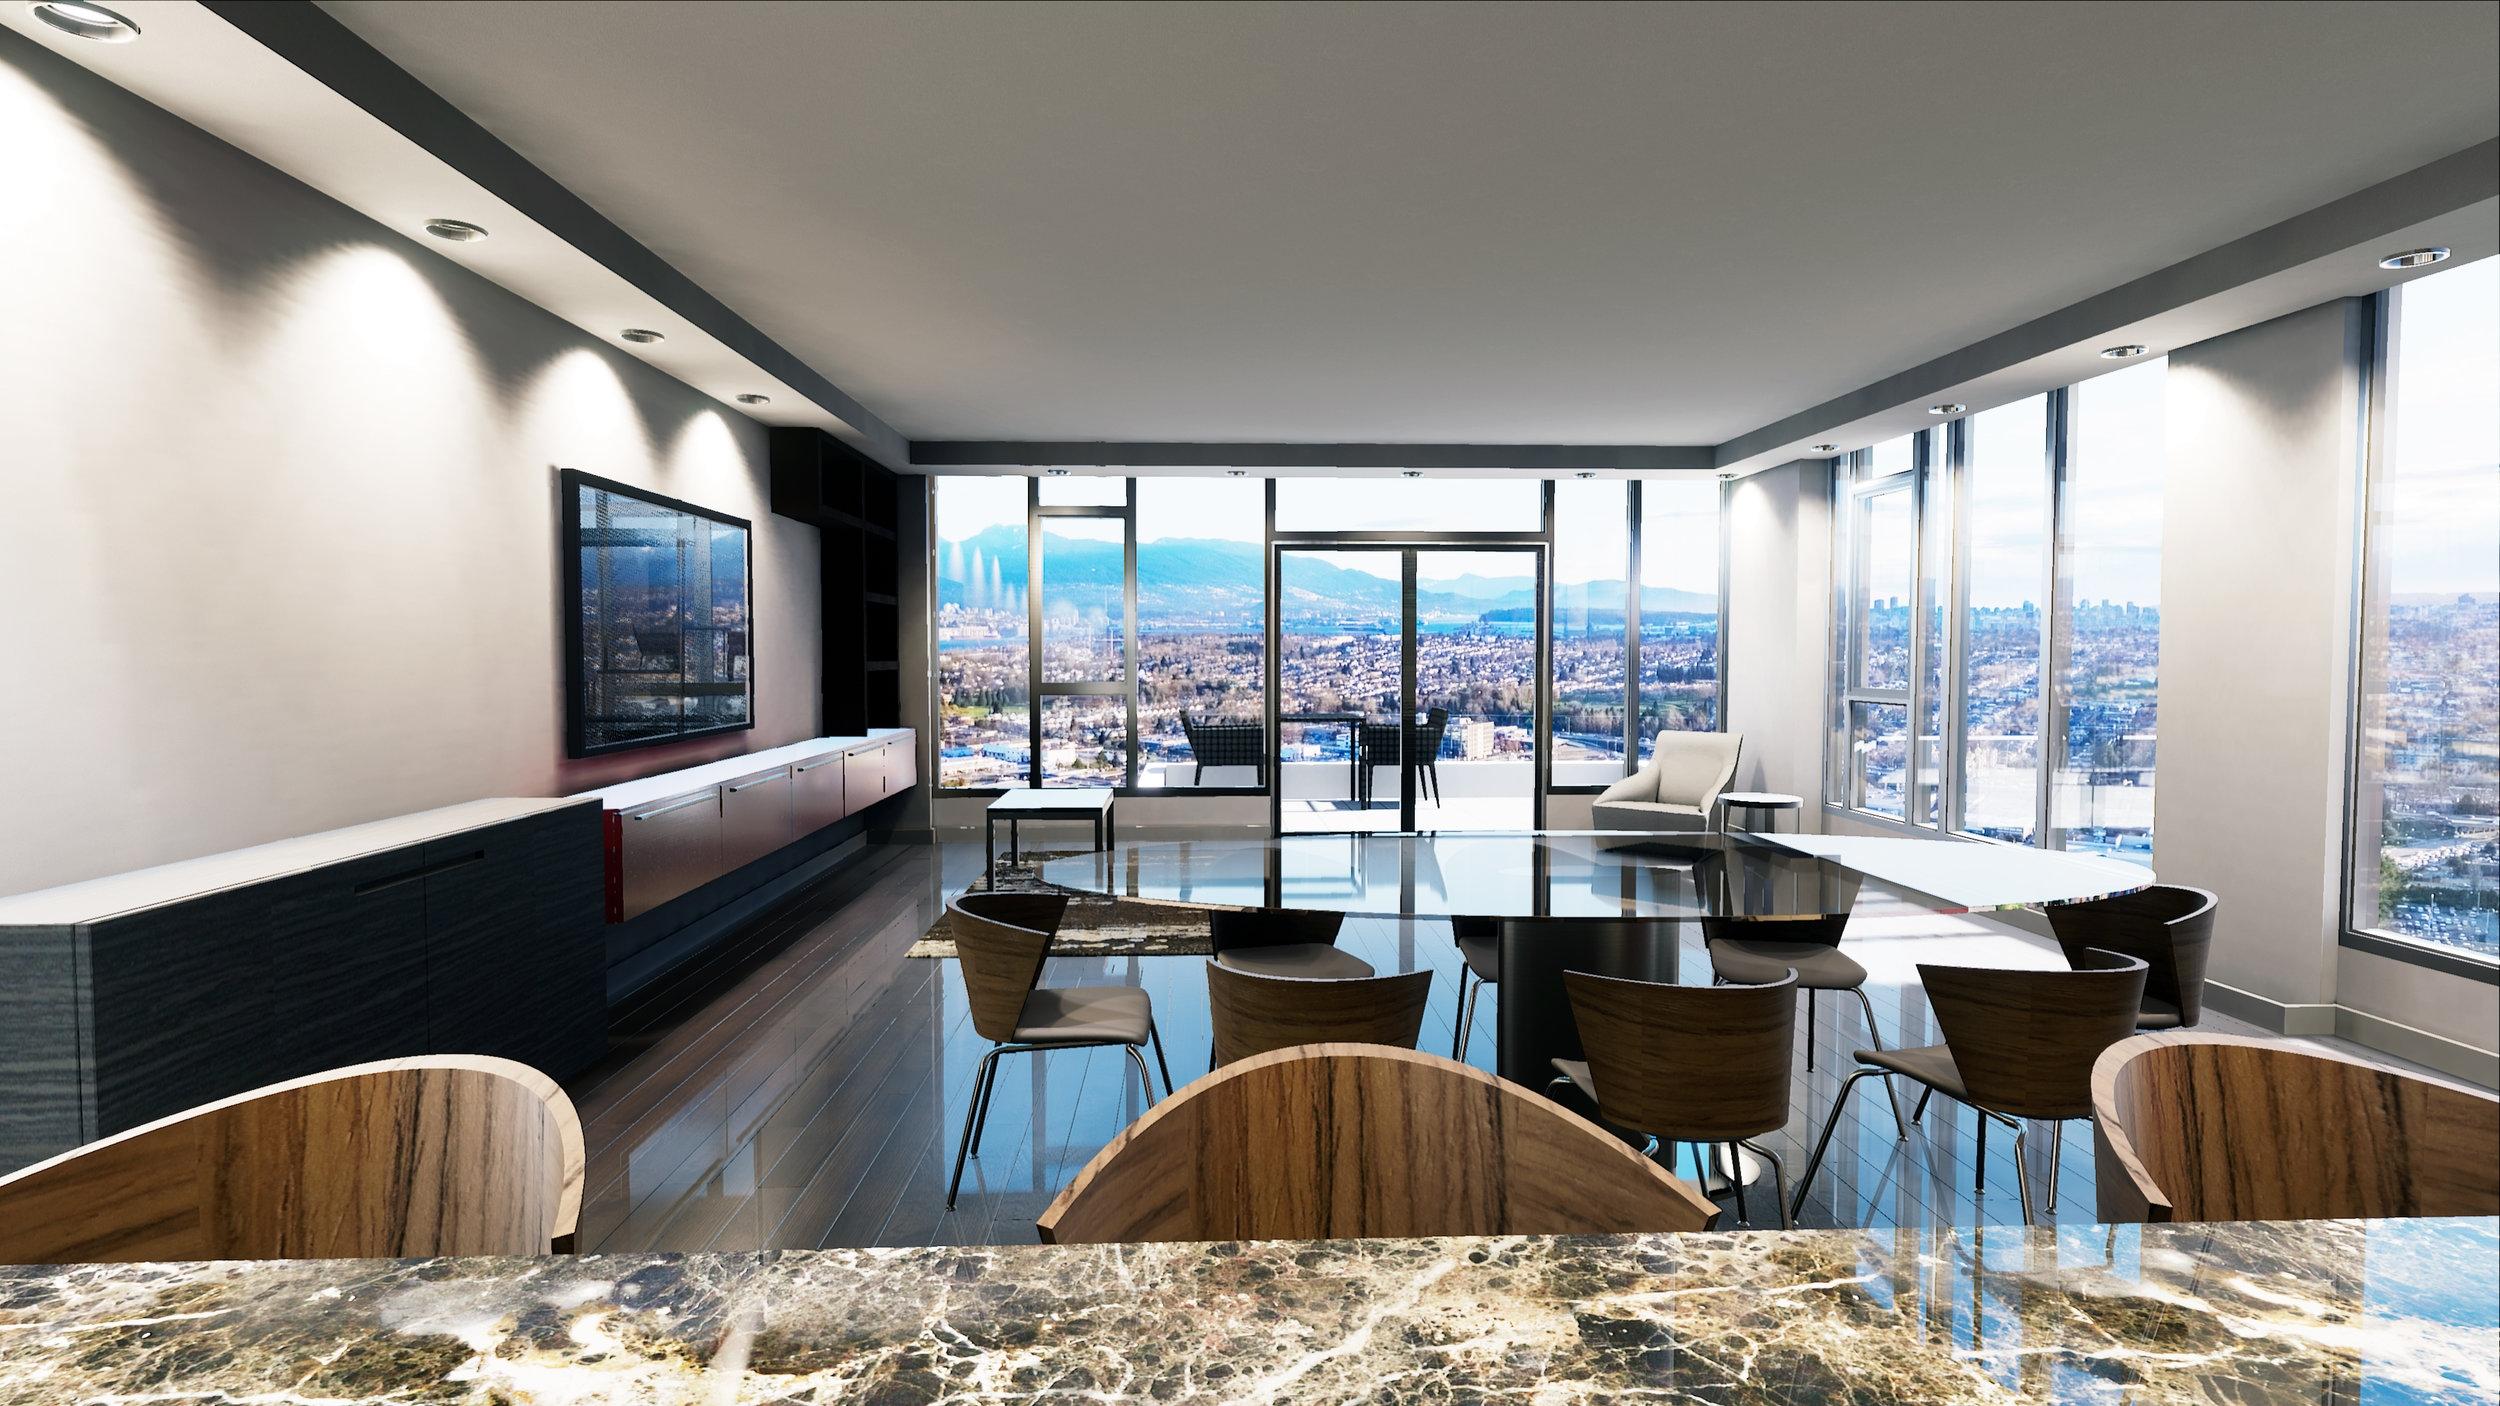 Apartment01_0001.jpg